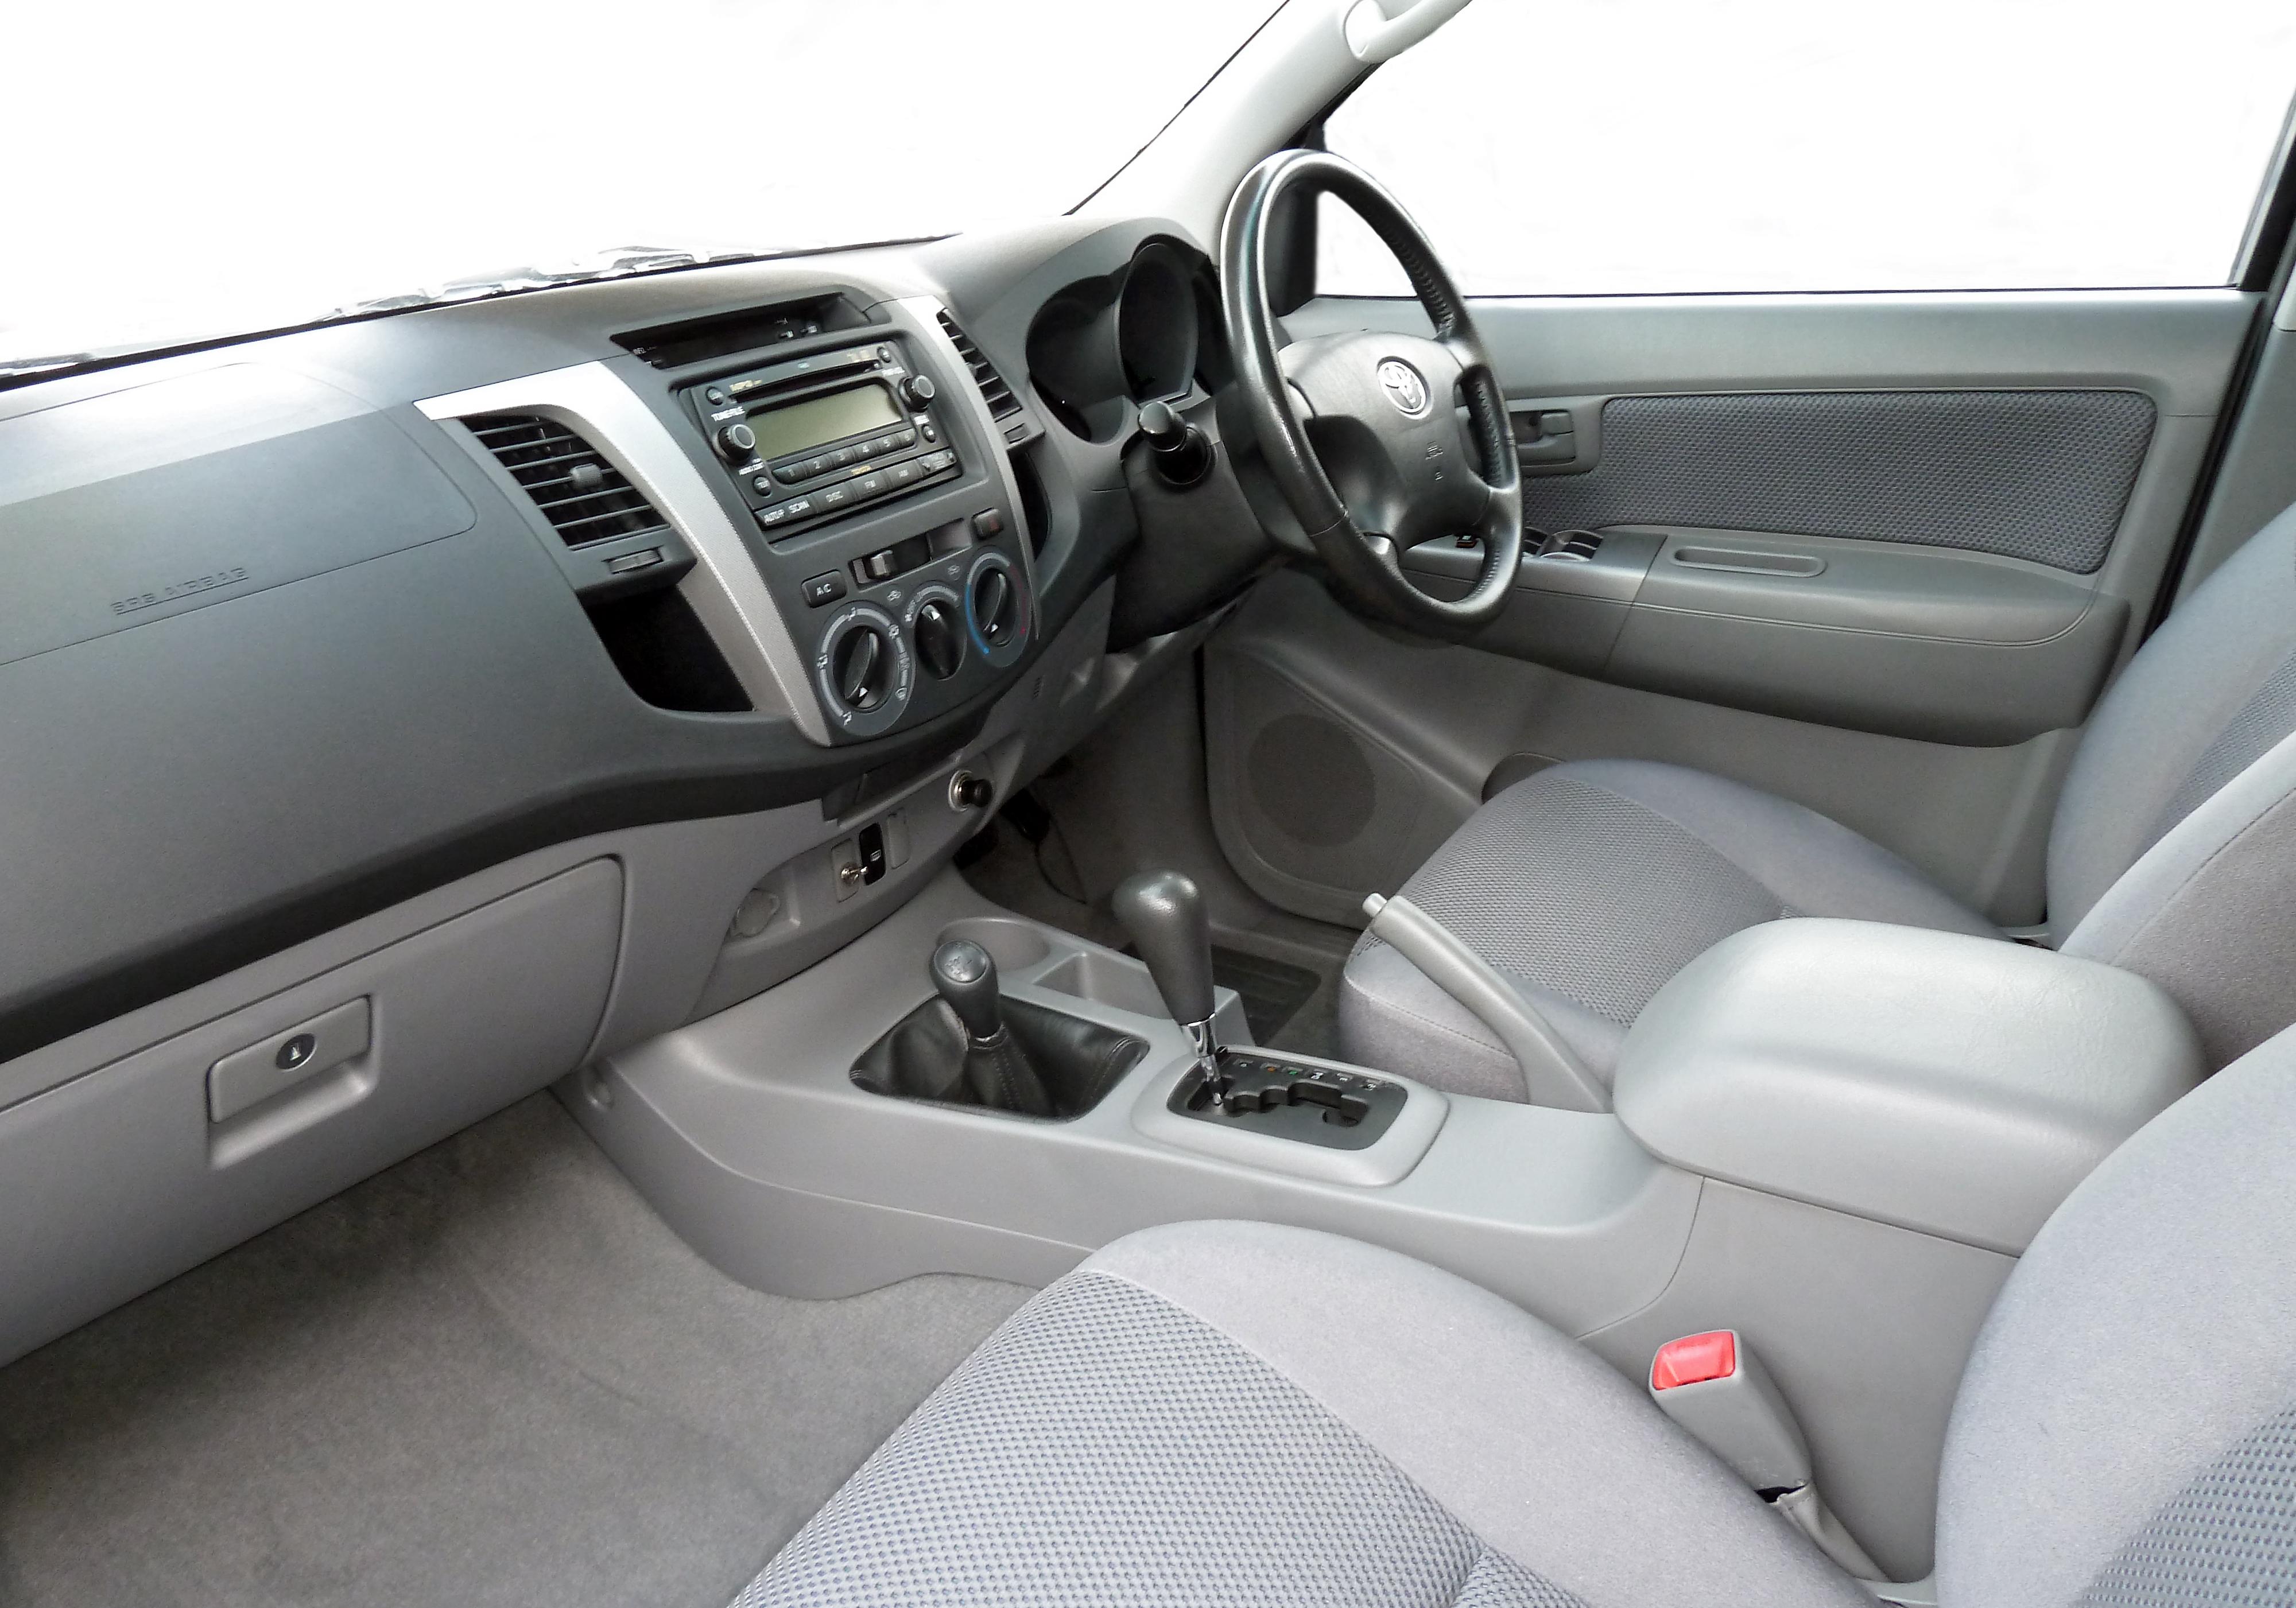 Kelebihan Toyota Hilux 2006 Perbandingan Harga